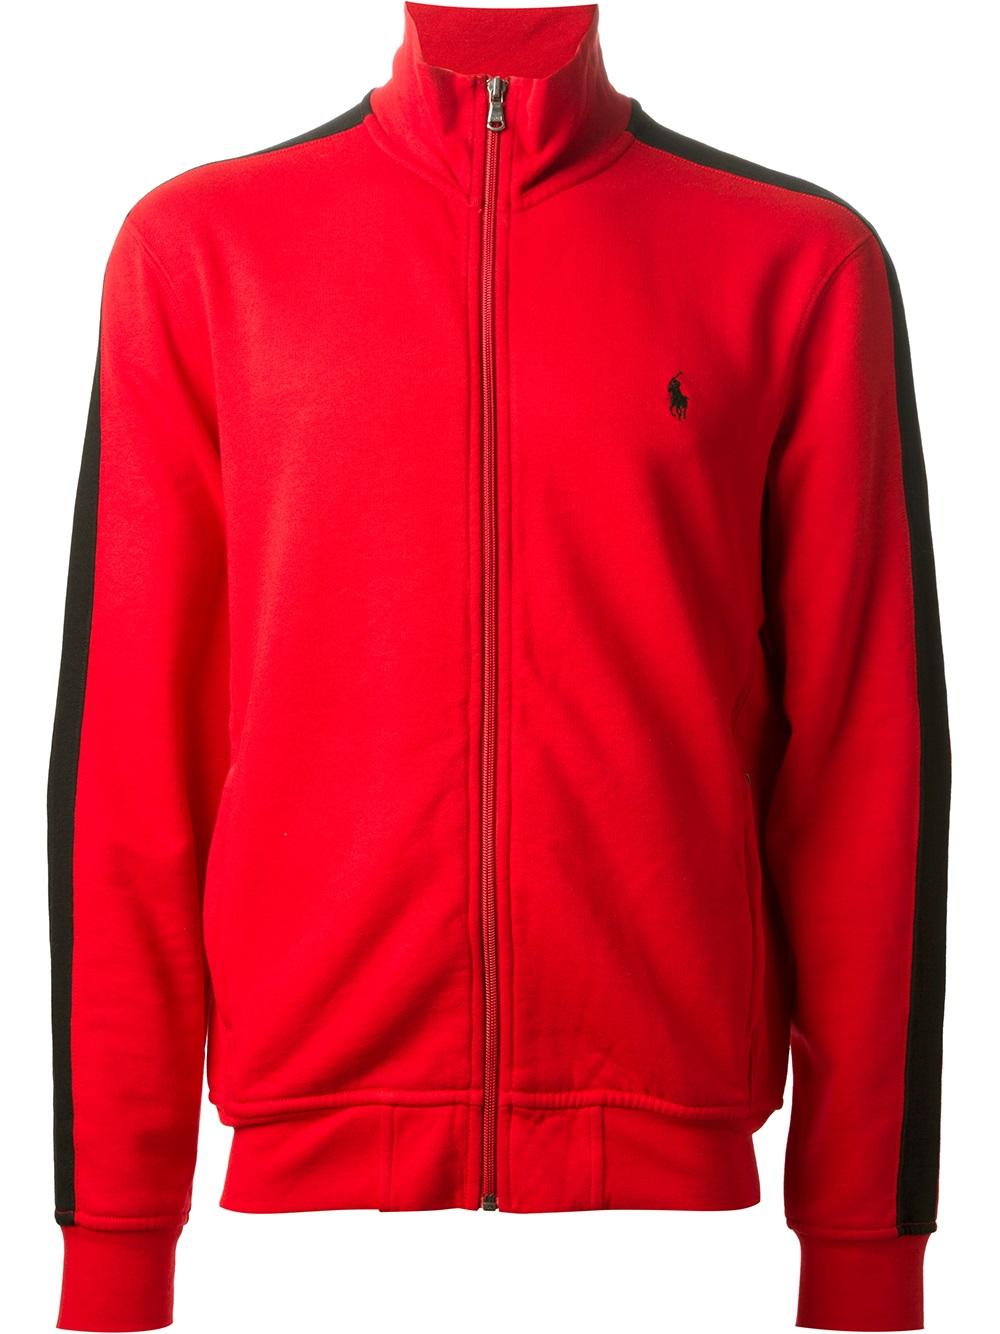 Lyst Polo Ralph Lauren Zipup Sweater In Red For Men